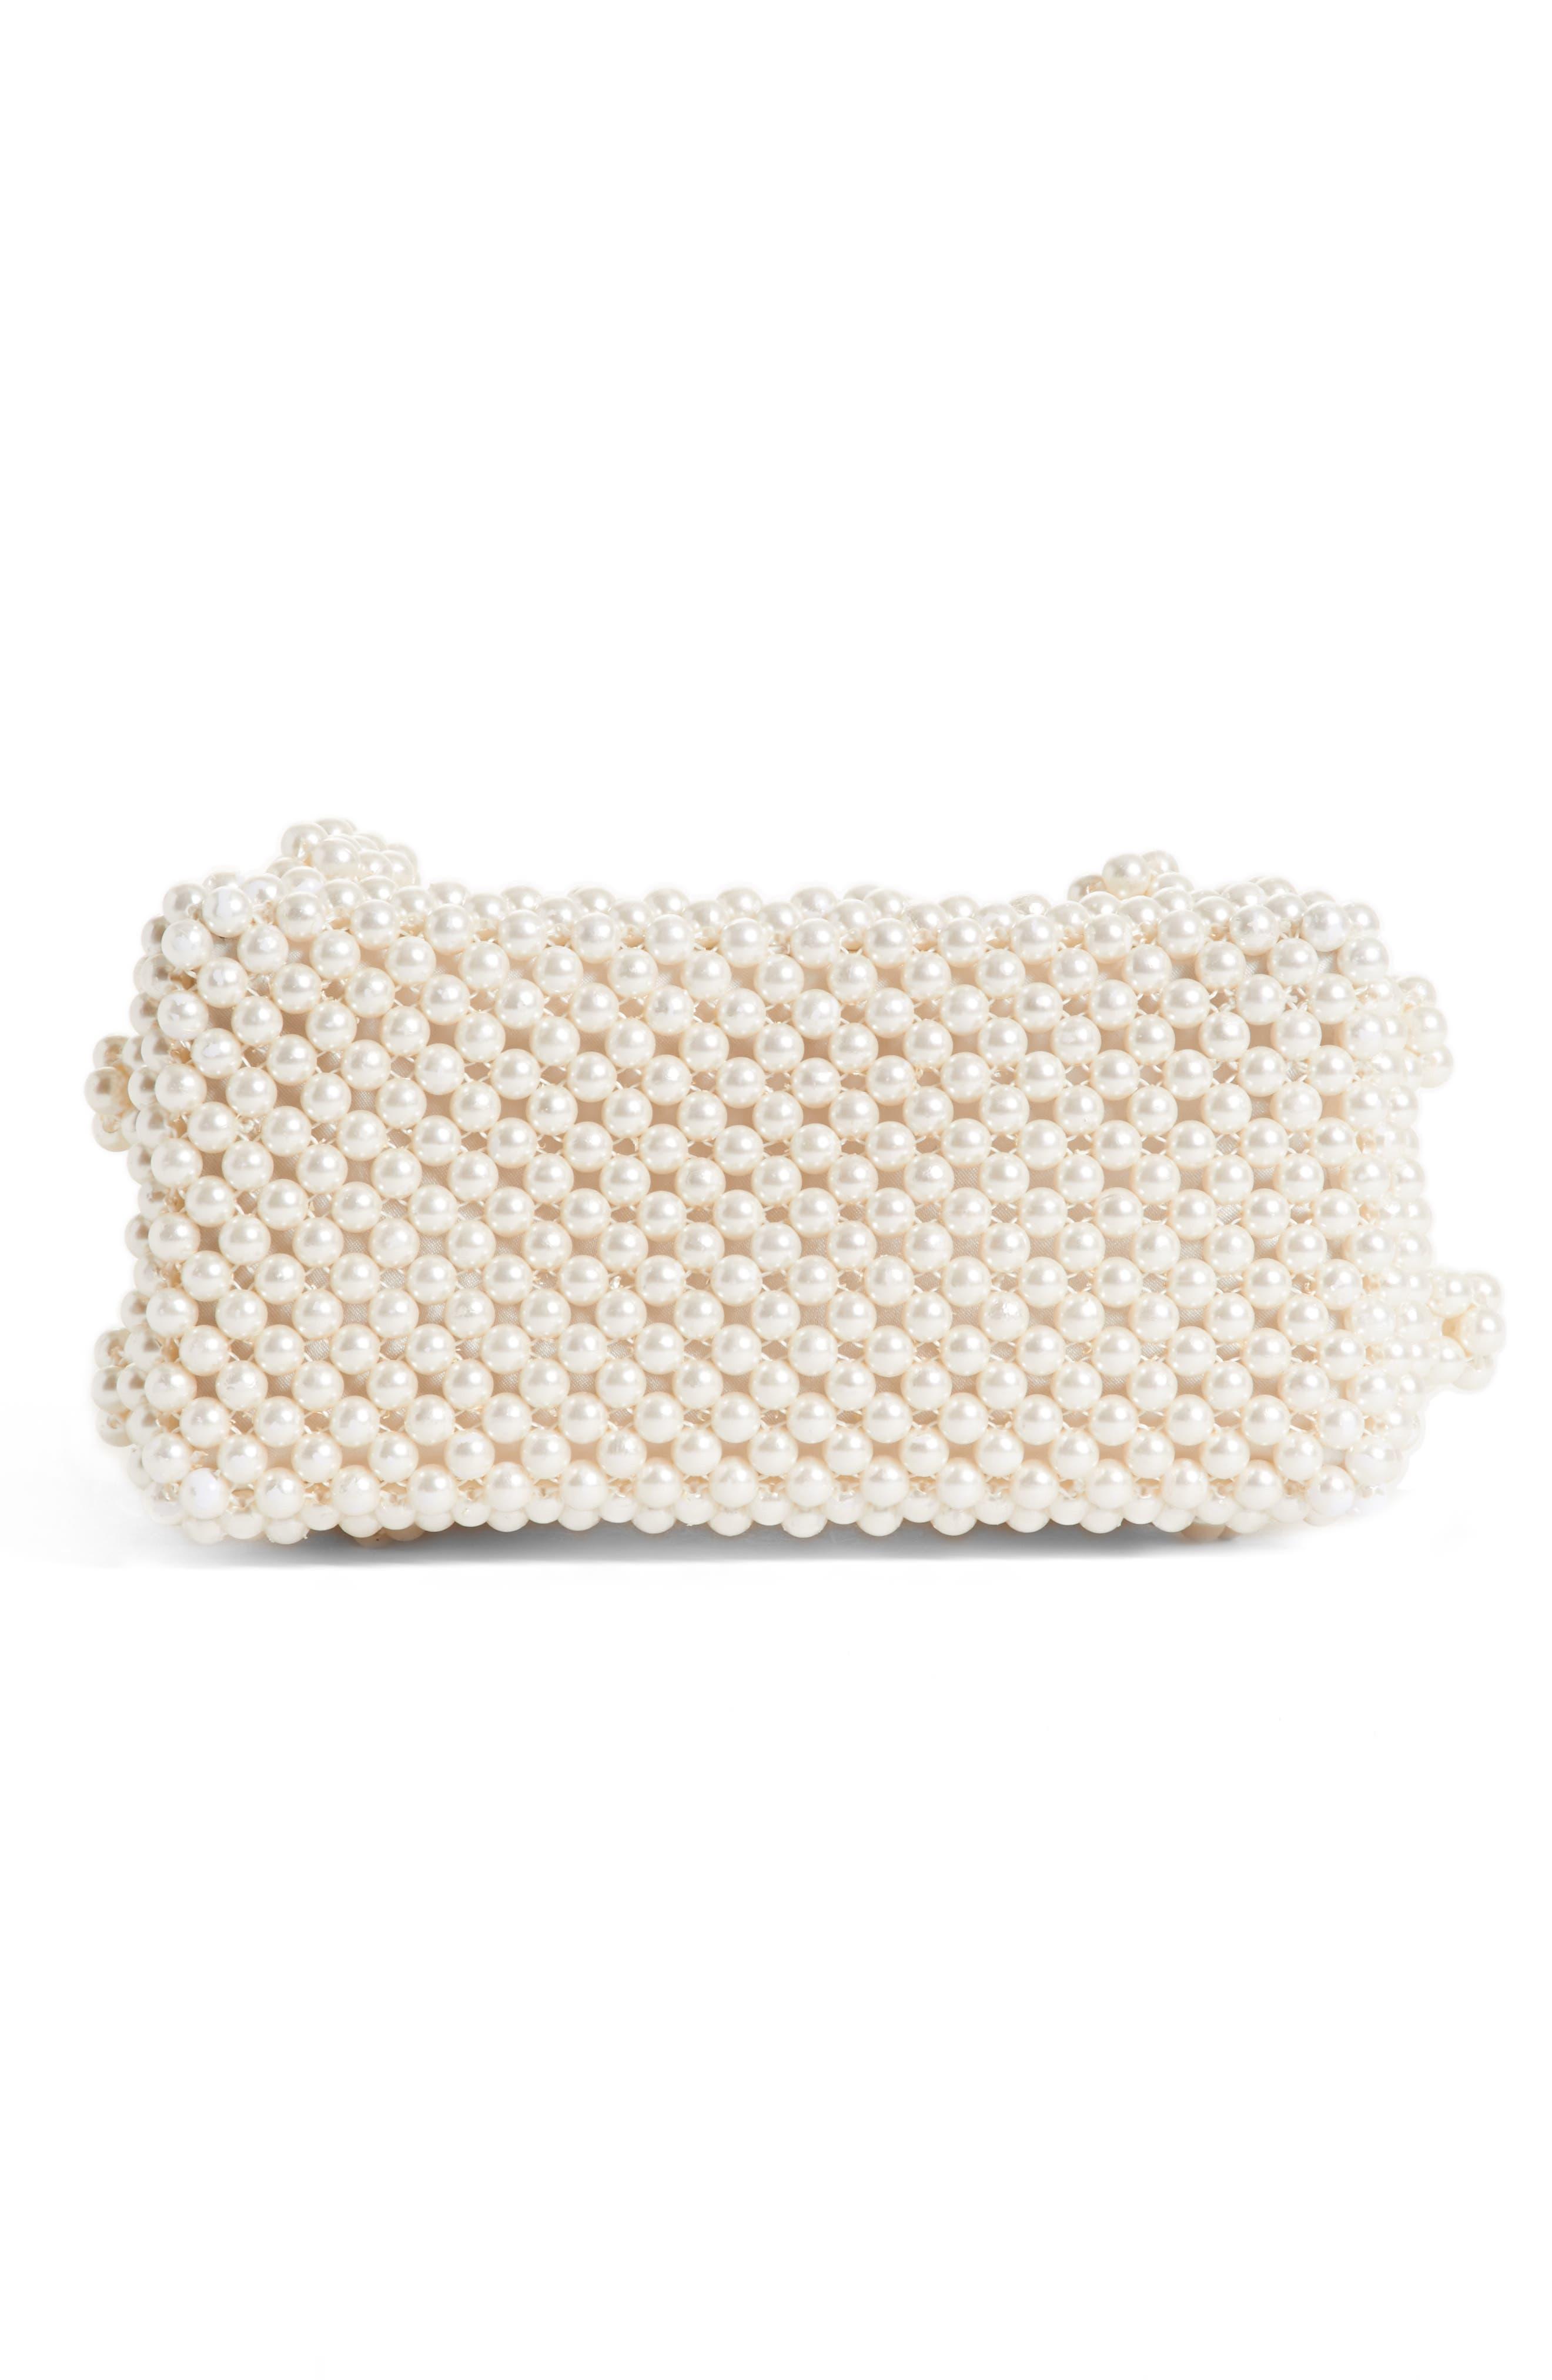 Antonia Small Imitation Pearl Beaded Handbag,                             Alternate thumbnail 6, color,                             900